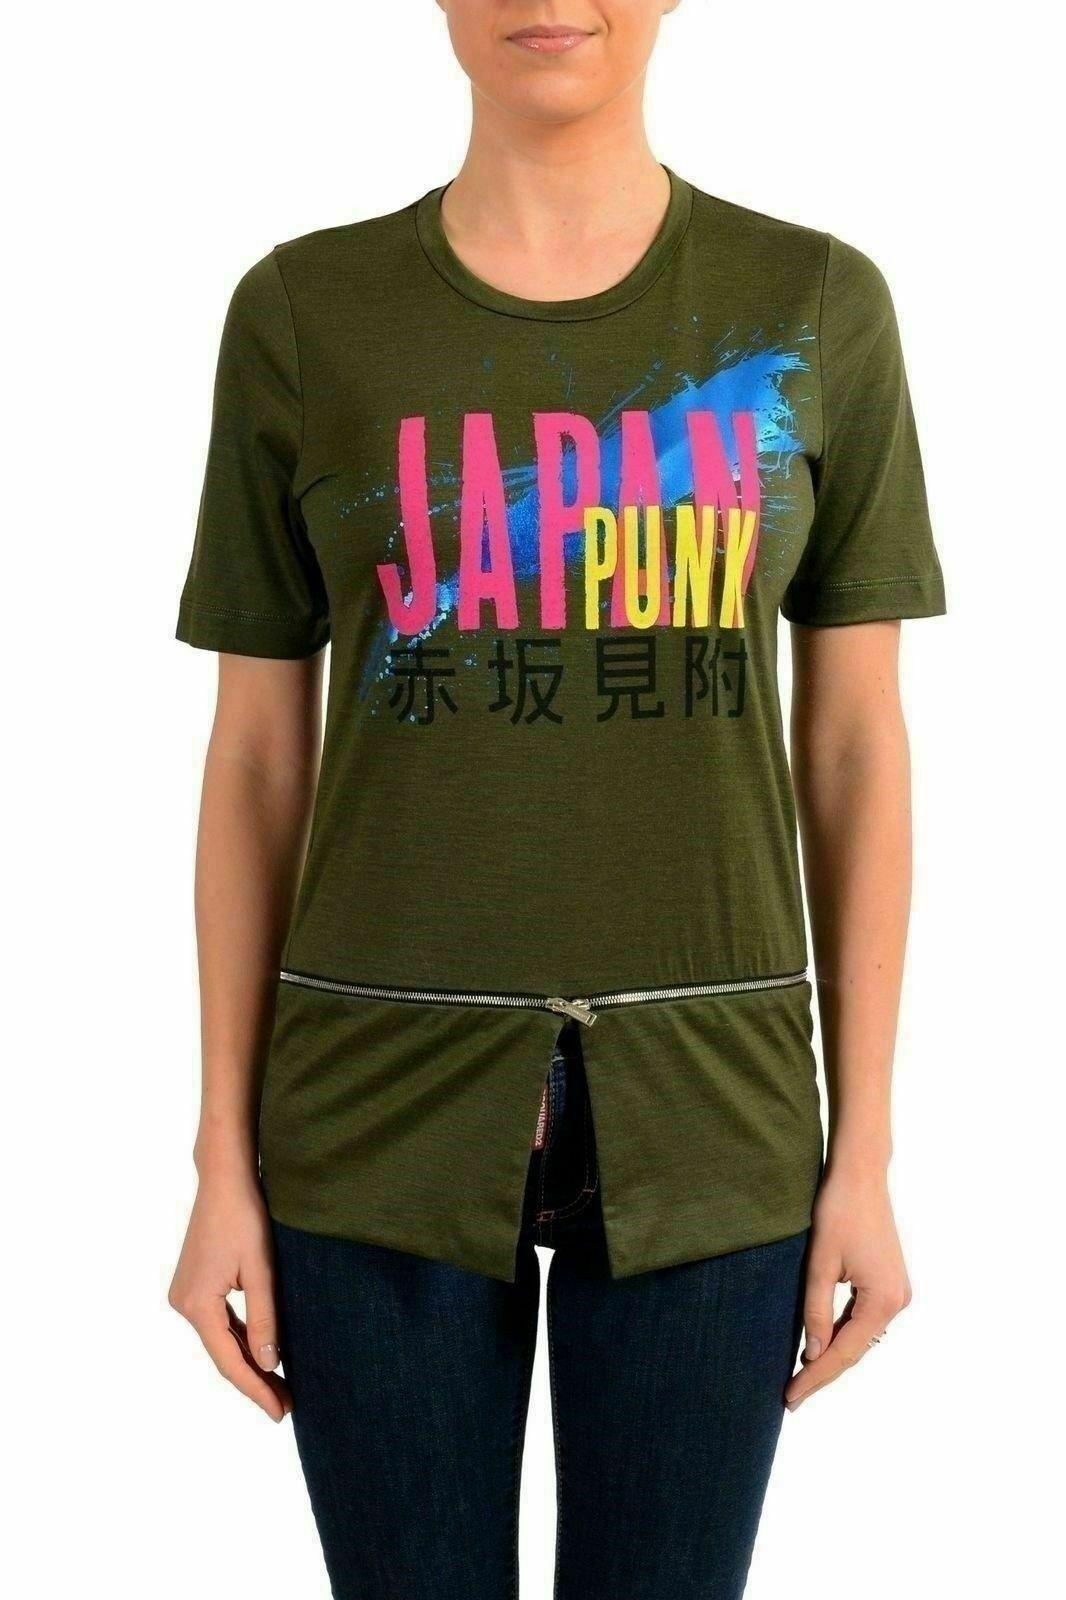 Dsquarot2 Damen 100% Wolle Grün Grafik Kurzarm T-Shirt Us XS es 38